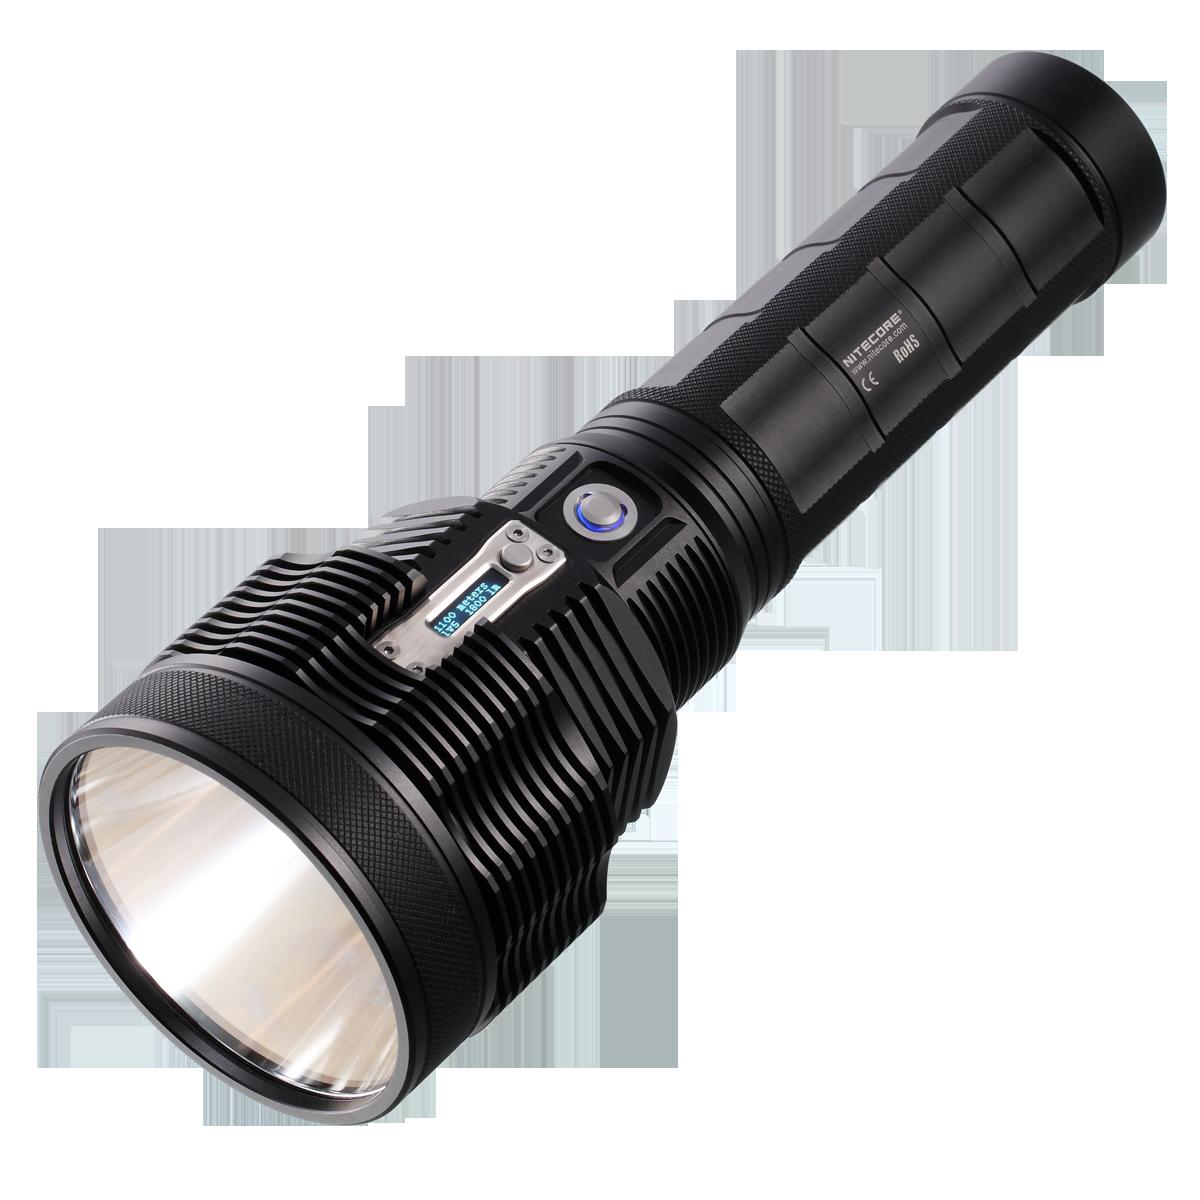 NITECORE EA42 1800 Lumen Super Bright Long Throw AA LED Searchlight Flashlight